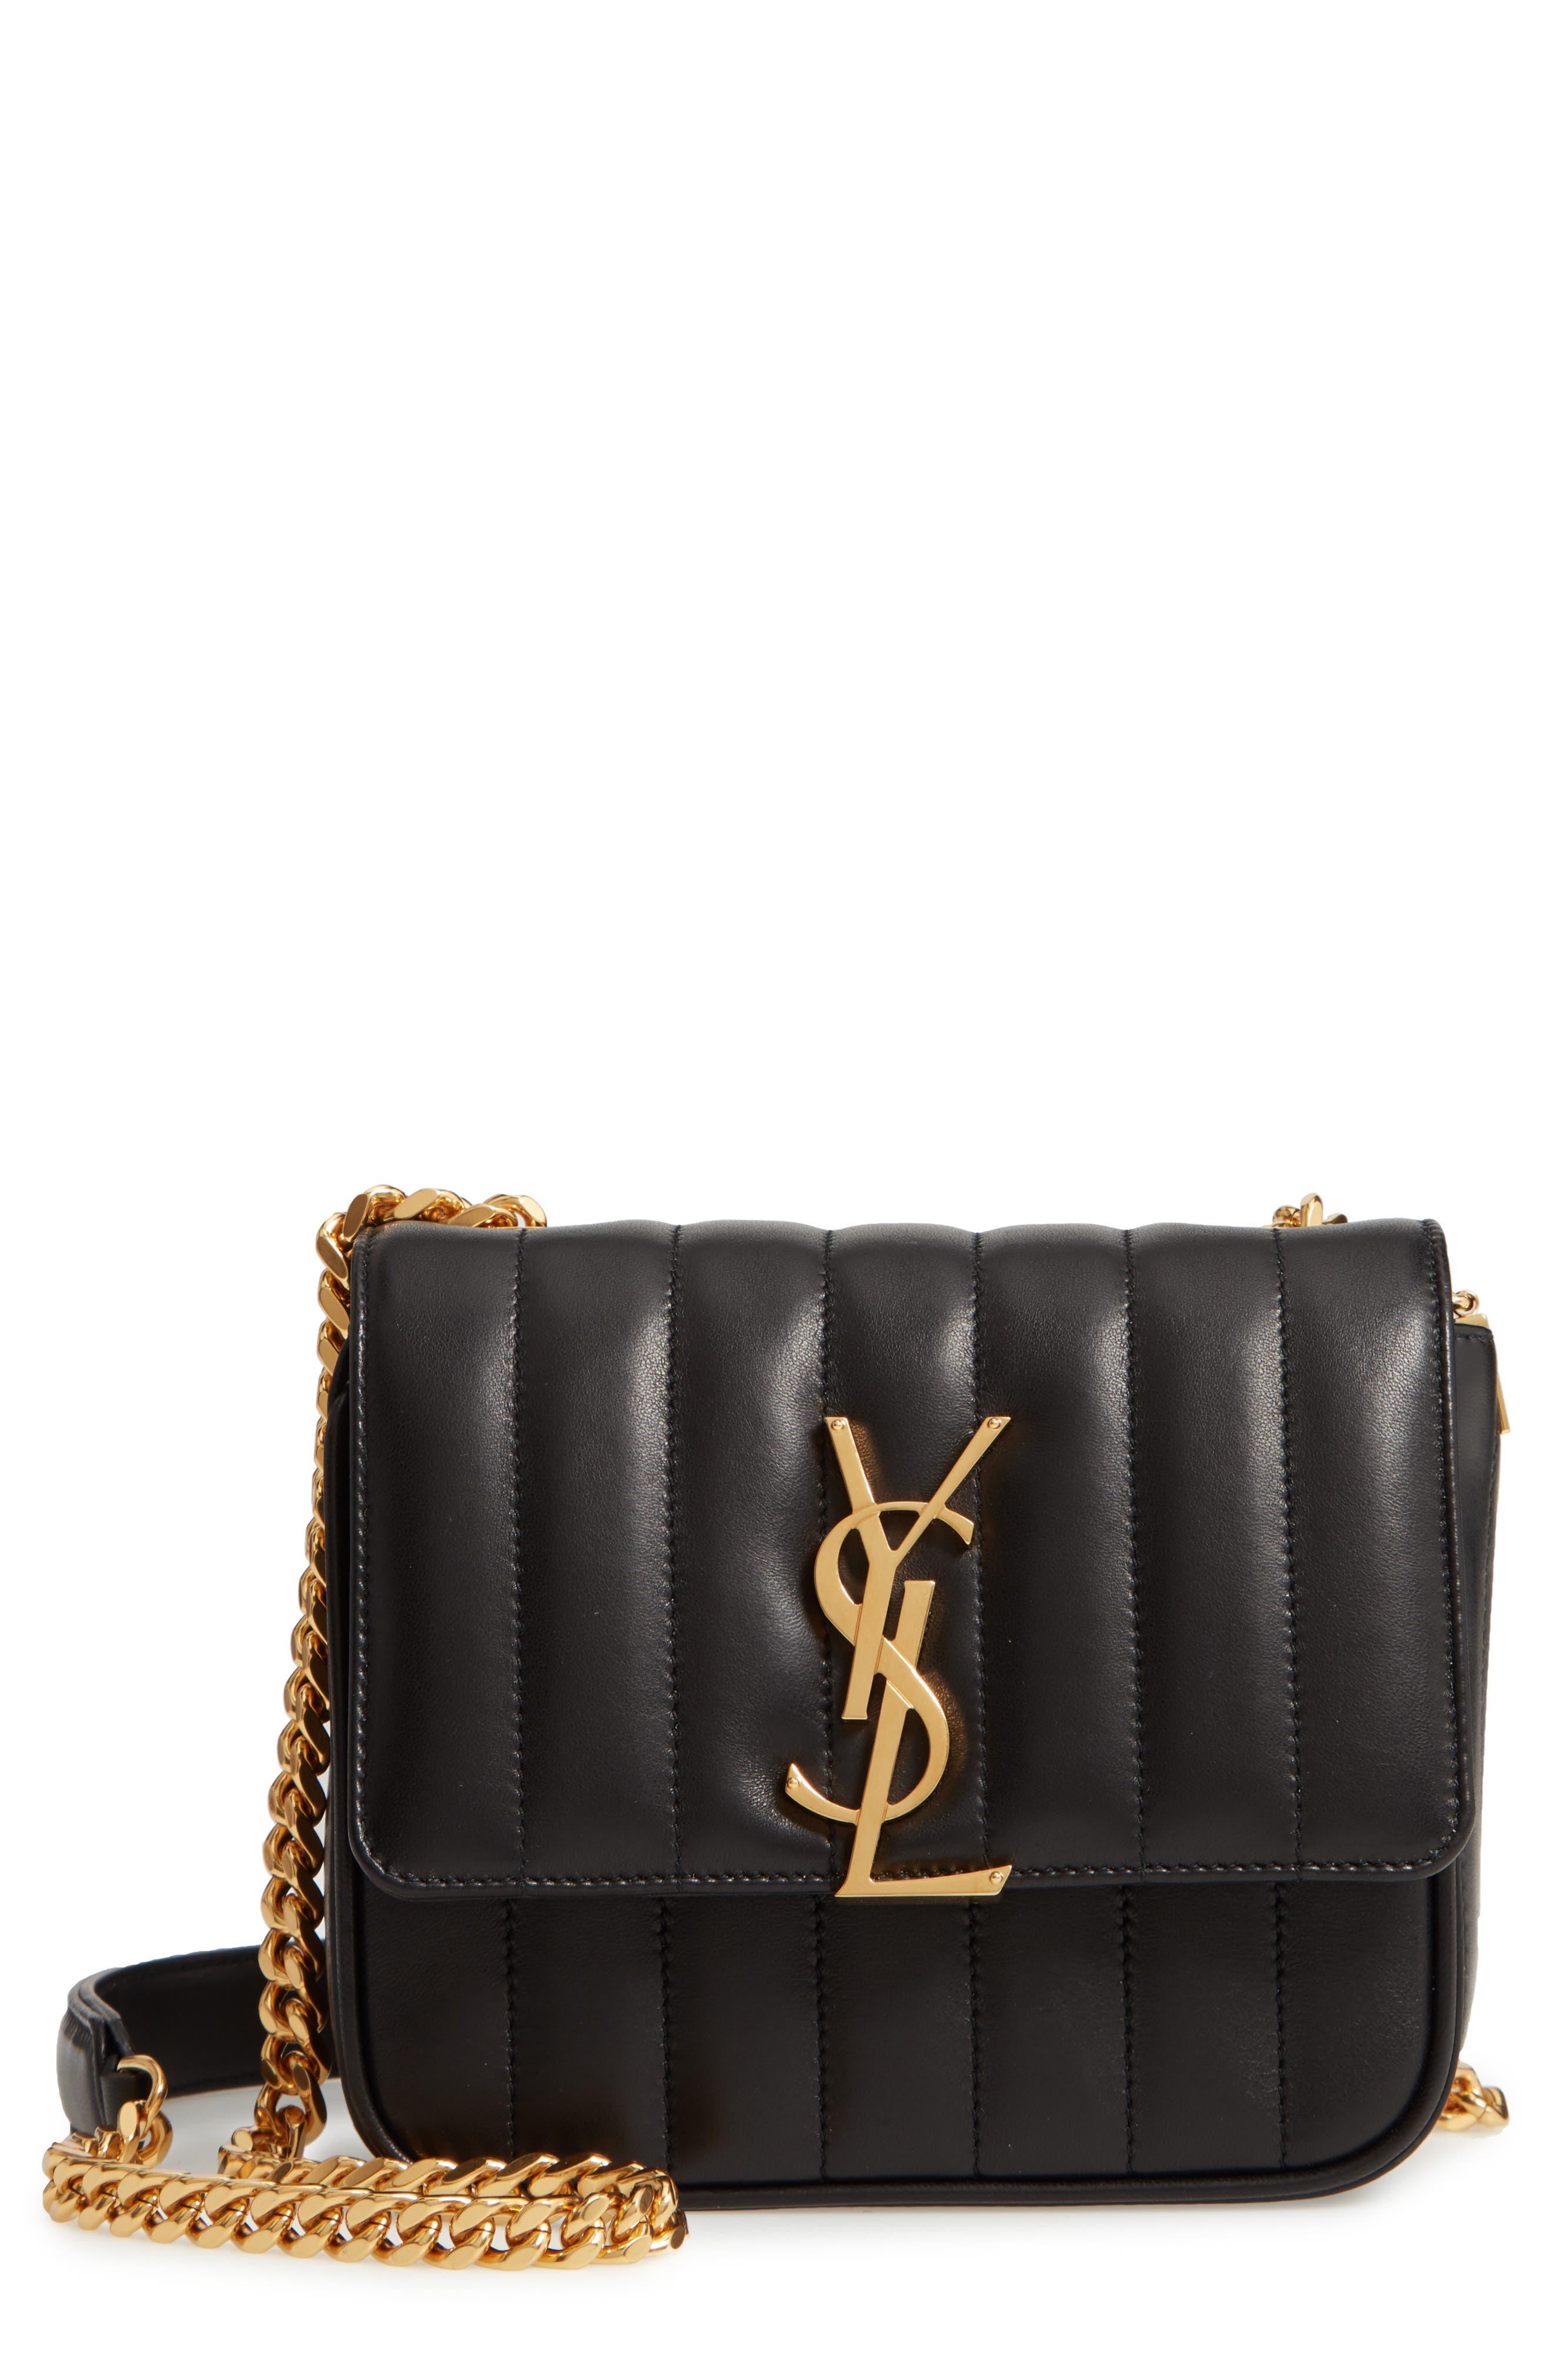 fea3e82c3bd4 channel handbag | Nordstrom